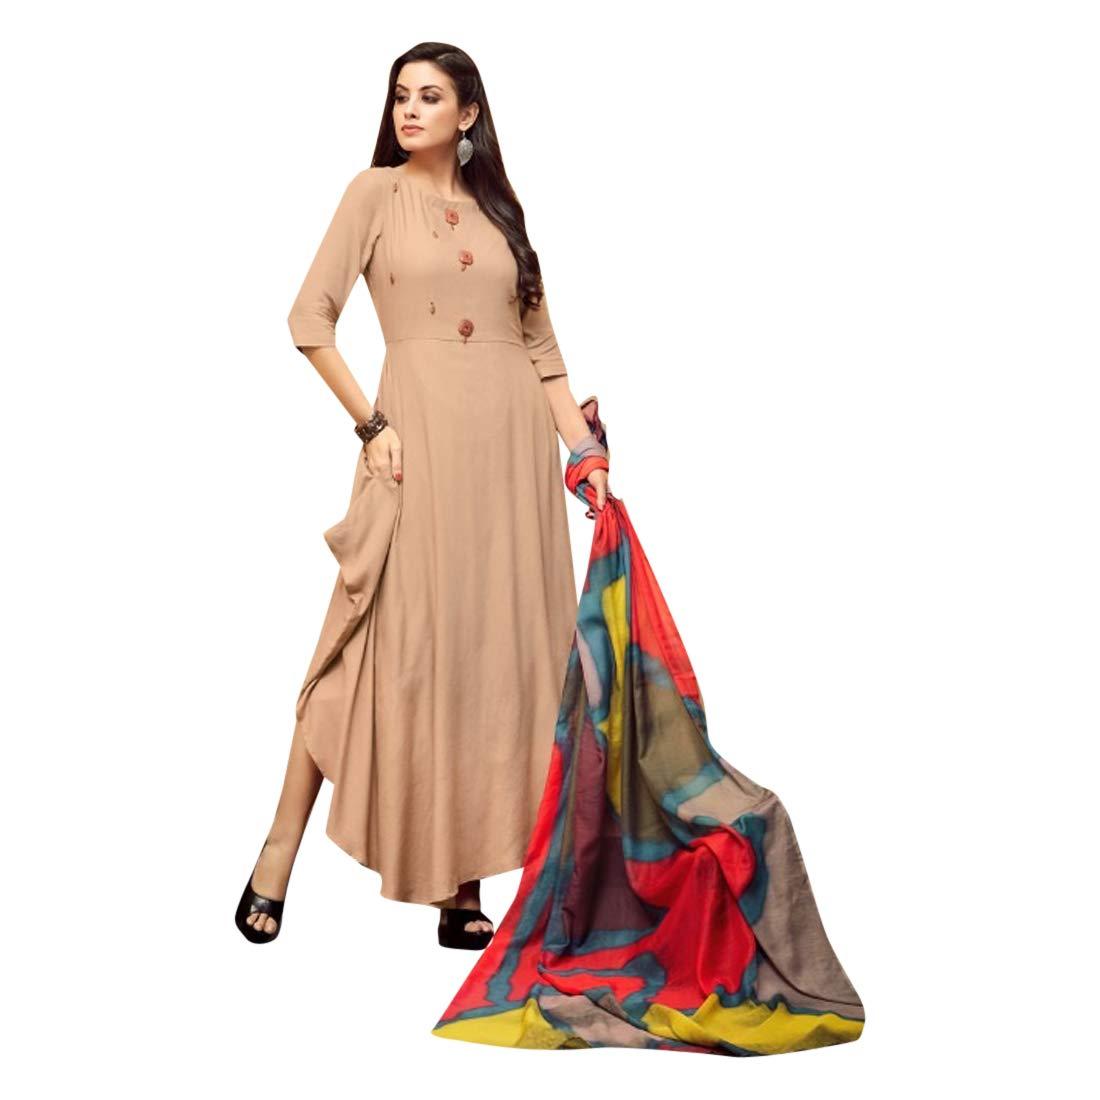 Stylish Indian Designer Silk Kurti with Printed Dupatta for Women Formal Kurta Festive wear 7519